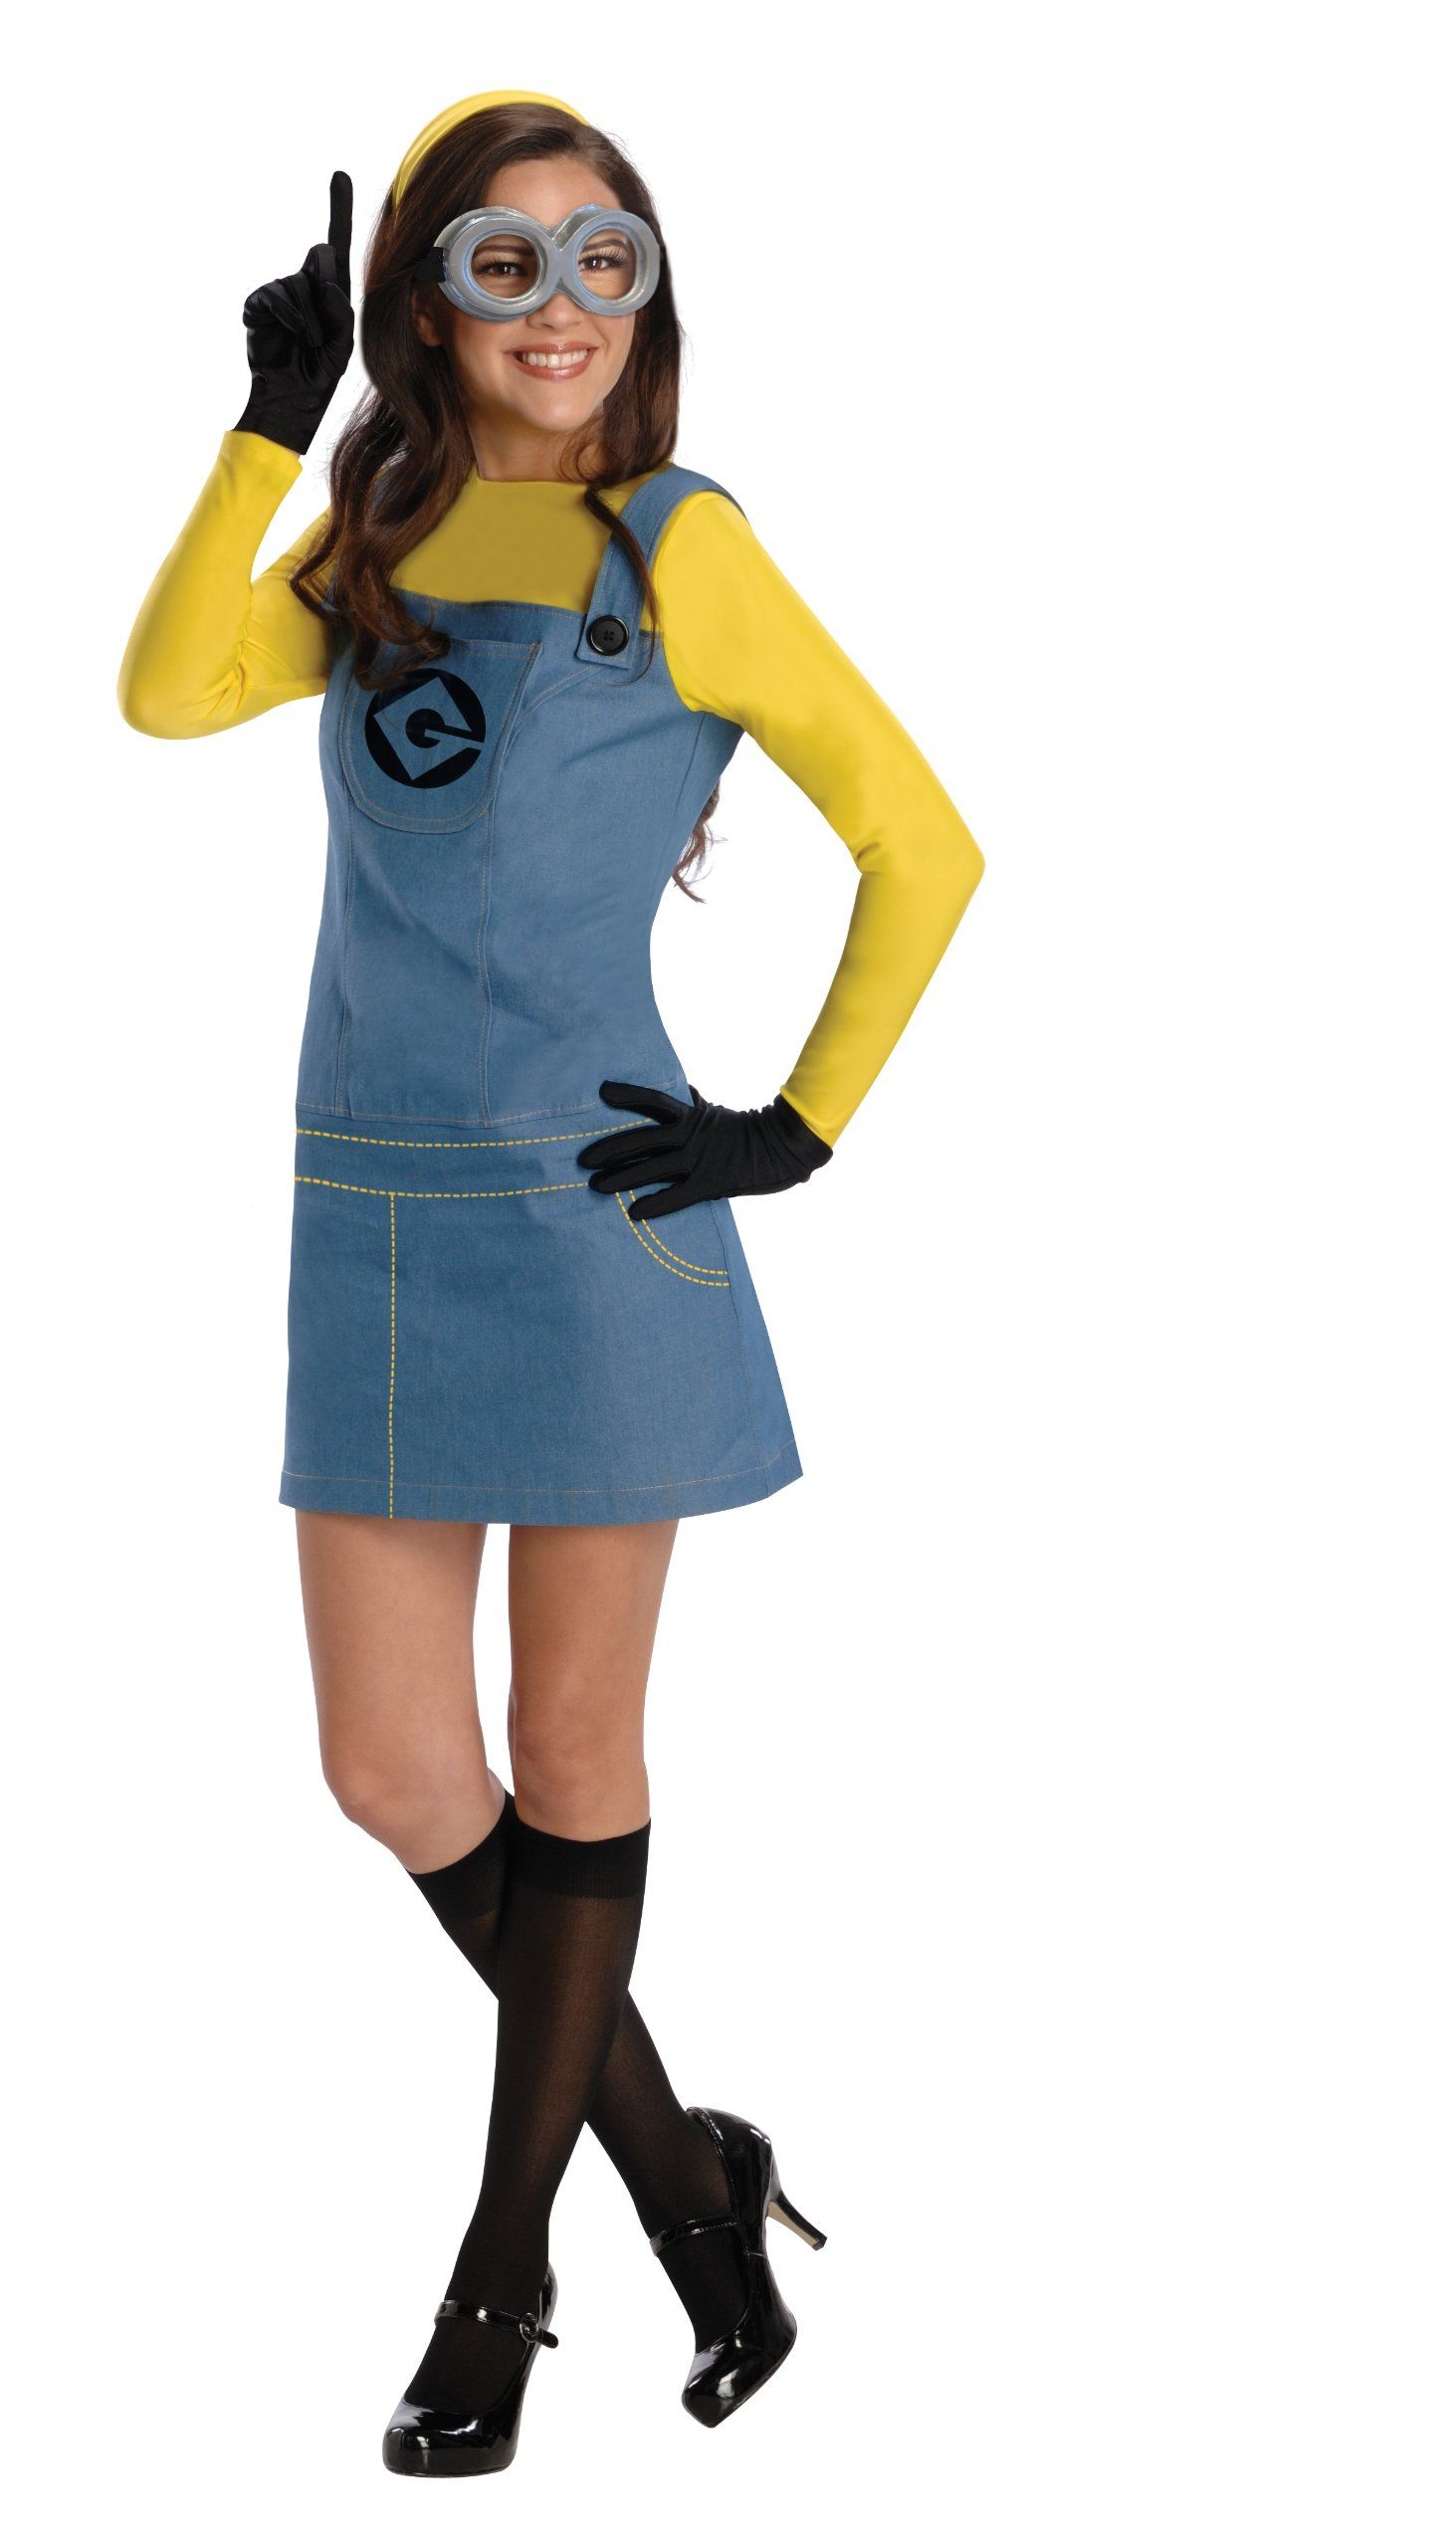 Secret Wishes Costume Despicable Me 2 Female Minion Dress With Accessories Multicolor Medium  sc 1 st  Pinterest & Secret Wishes Costume Despicable Me 2 Female Minion Dress With ...